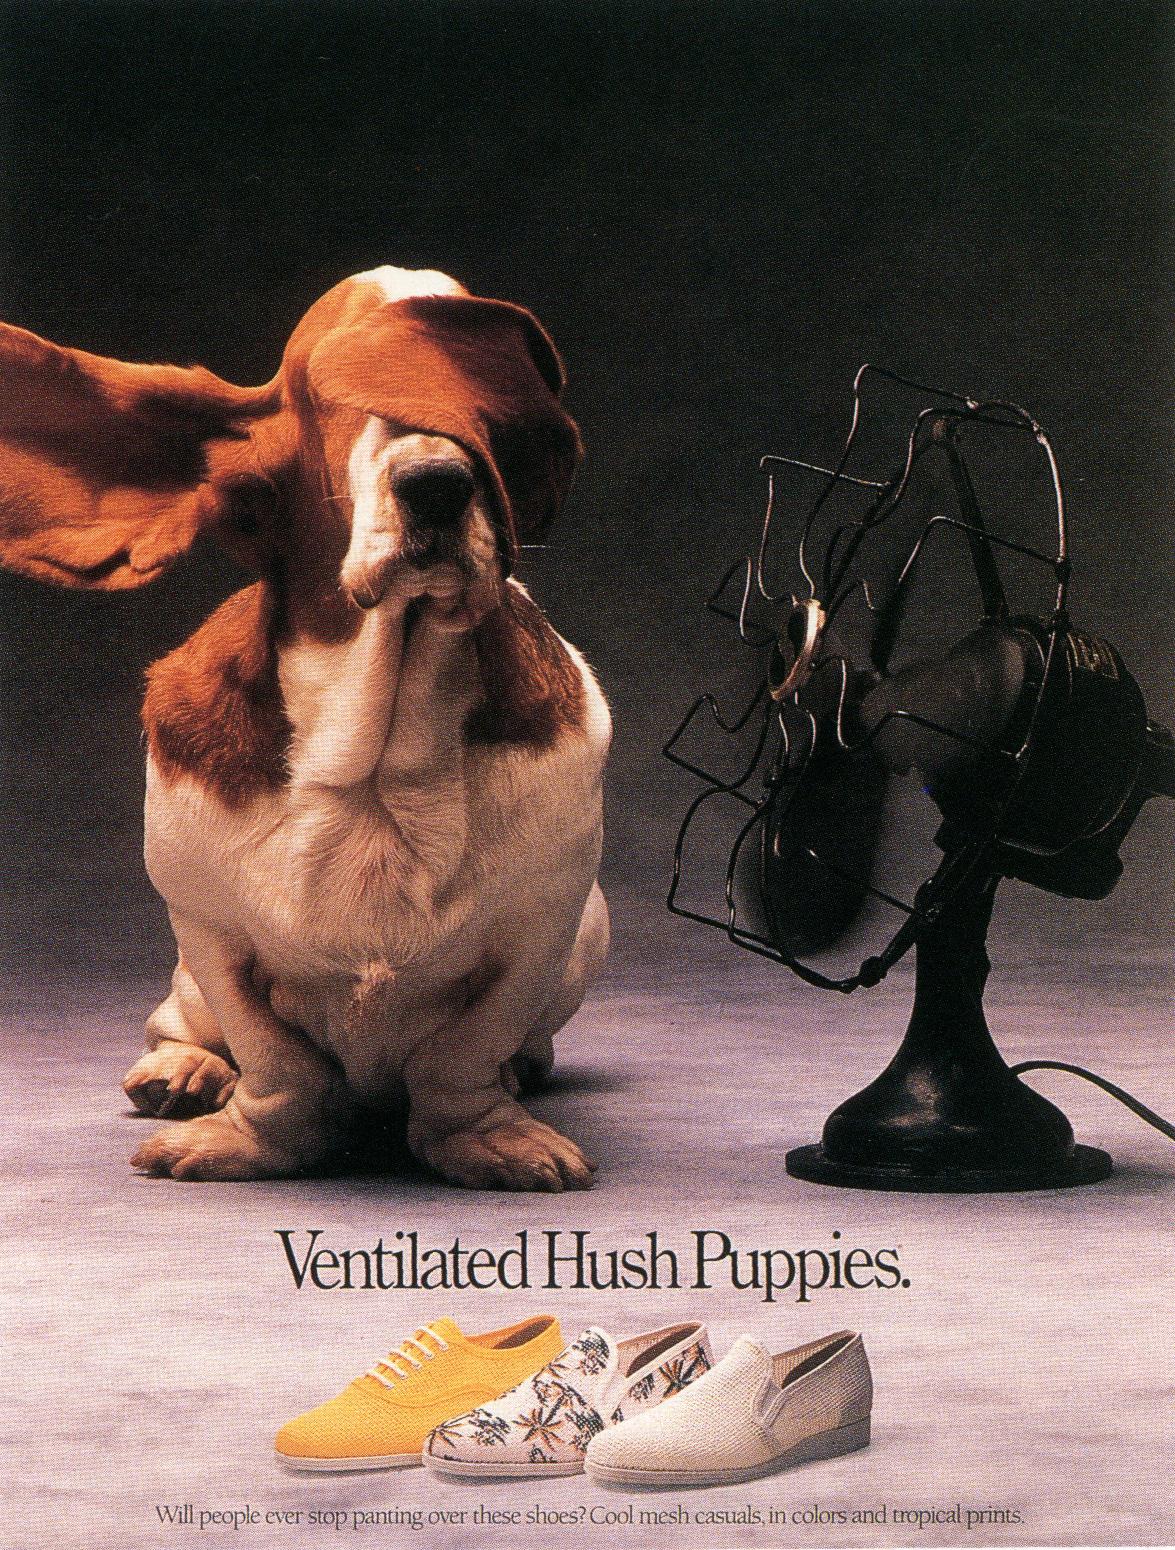 Fallon McElligott, Hush Puppies, 'Ventilated'-01